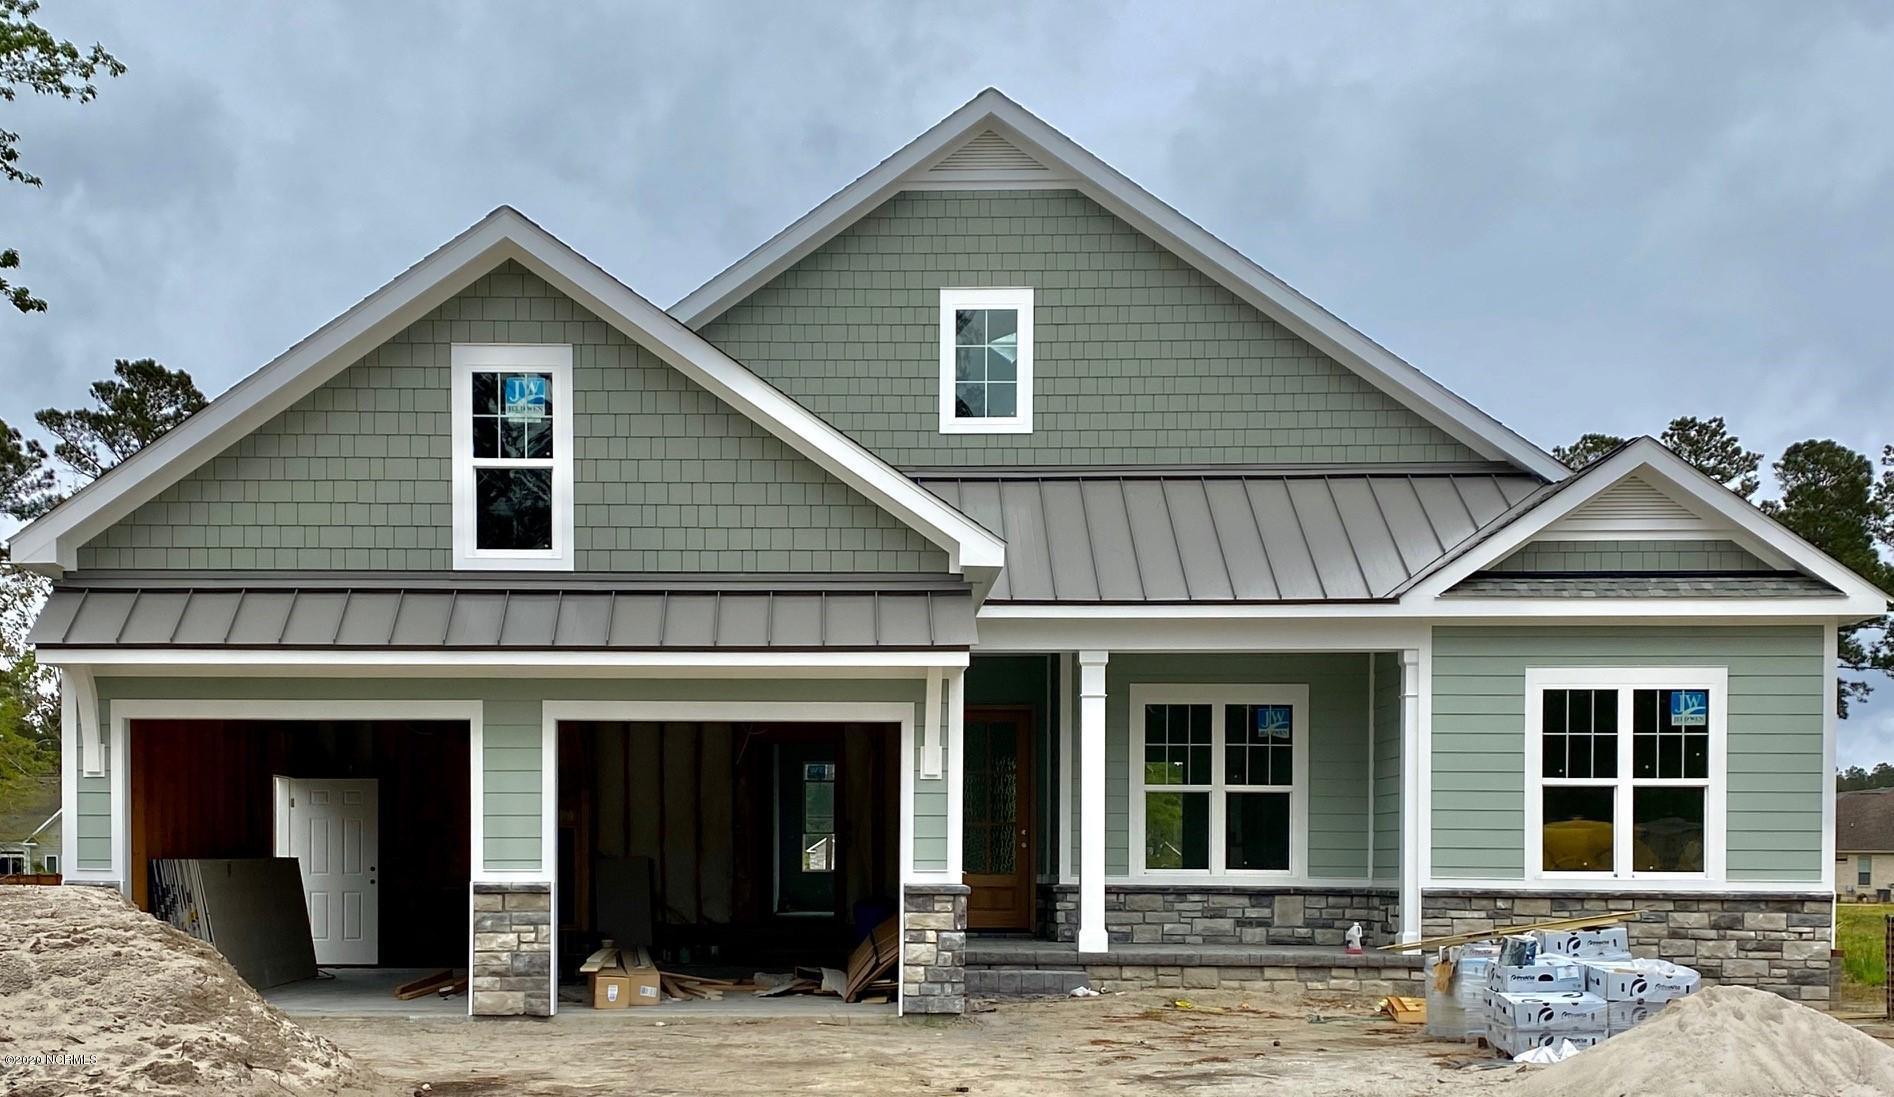 3015 Watercrest Loop, New Bern, North Carolina 28562, 3 Bedrooms Bedrooms, ,2 BathroomsBathrooms,Residential,For Sale,Watercrest,100214306